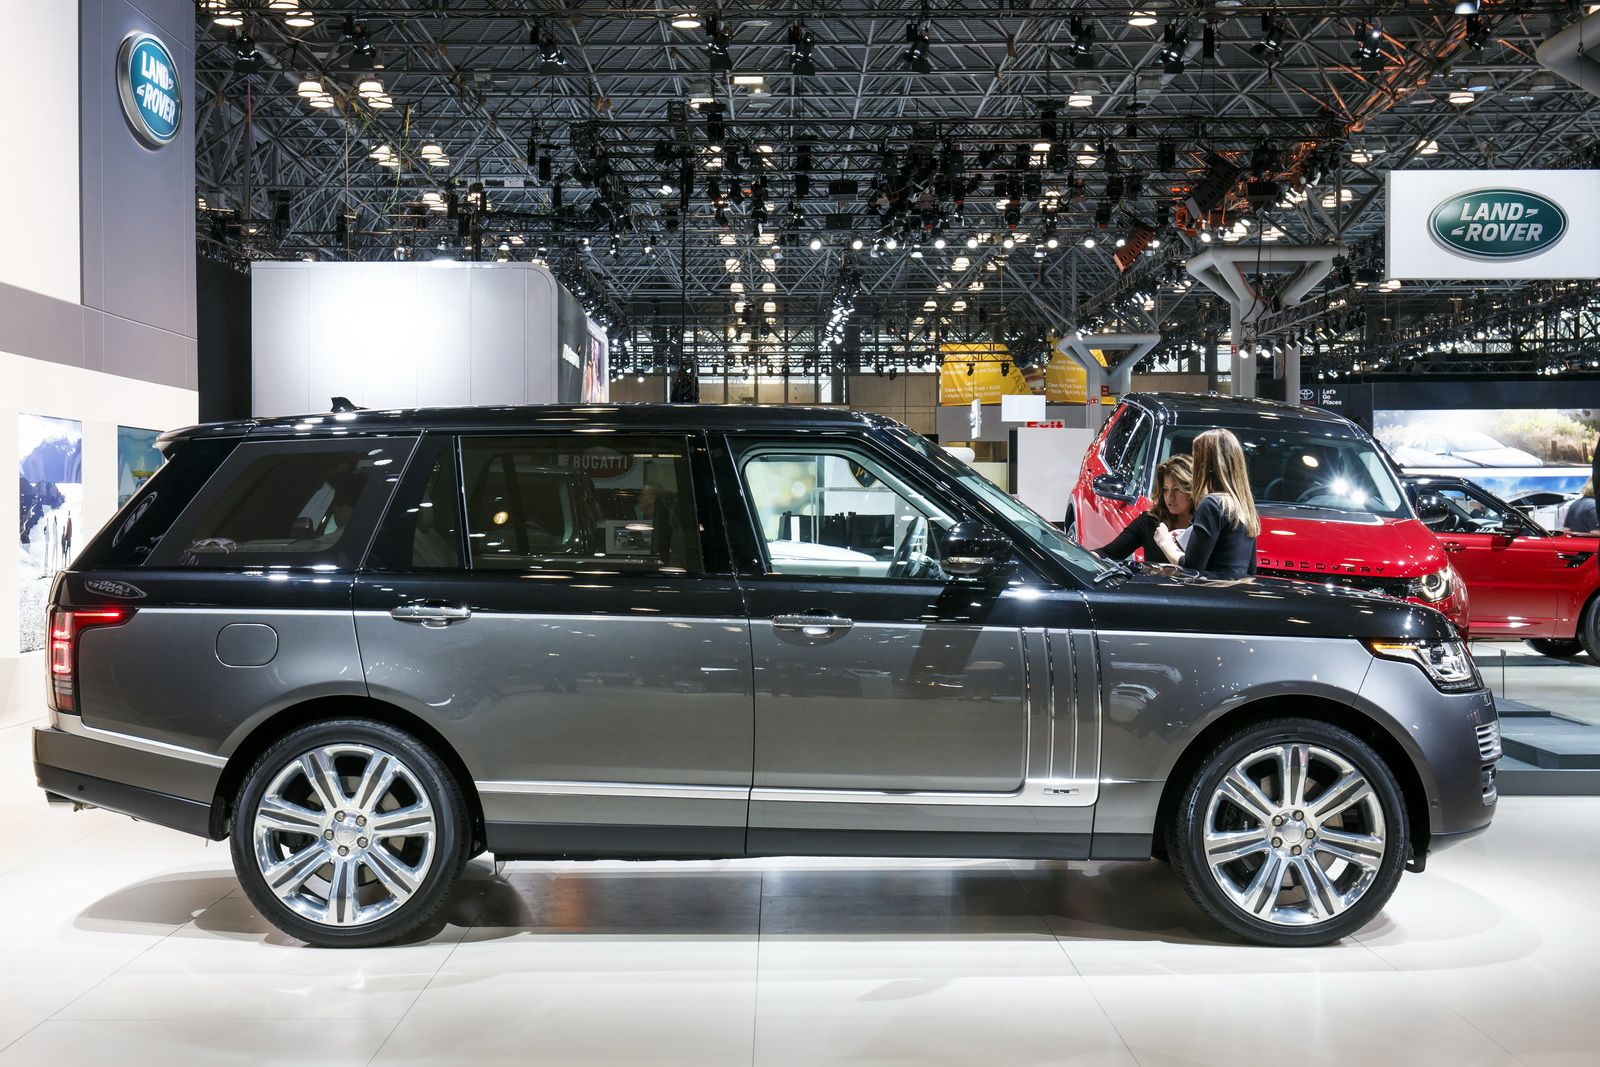 2016 Range Rover Svautobiography Brings Ultimate 4x4 Luxury To New York Carscoops Range Rover Luxury Cars Range Rover Range Rover Supercharged